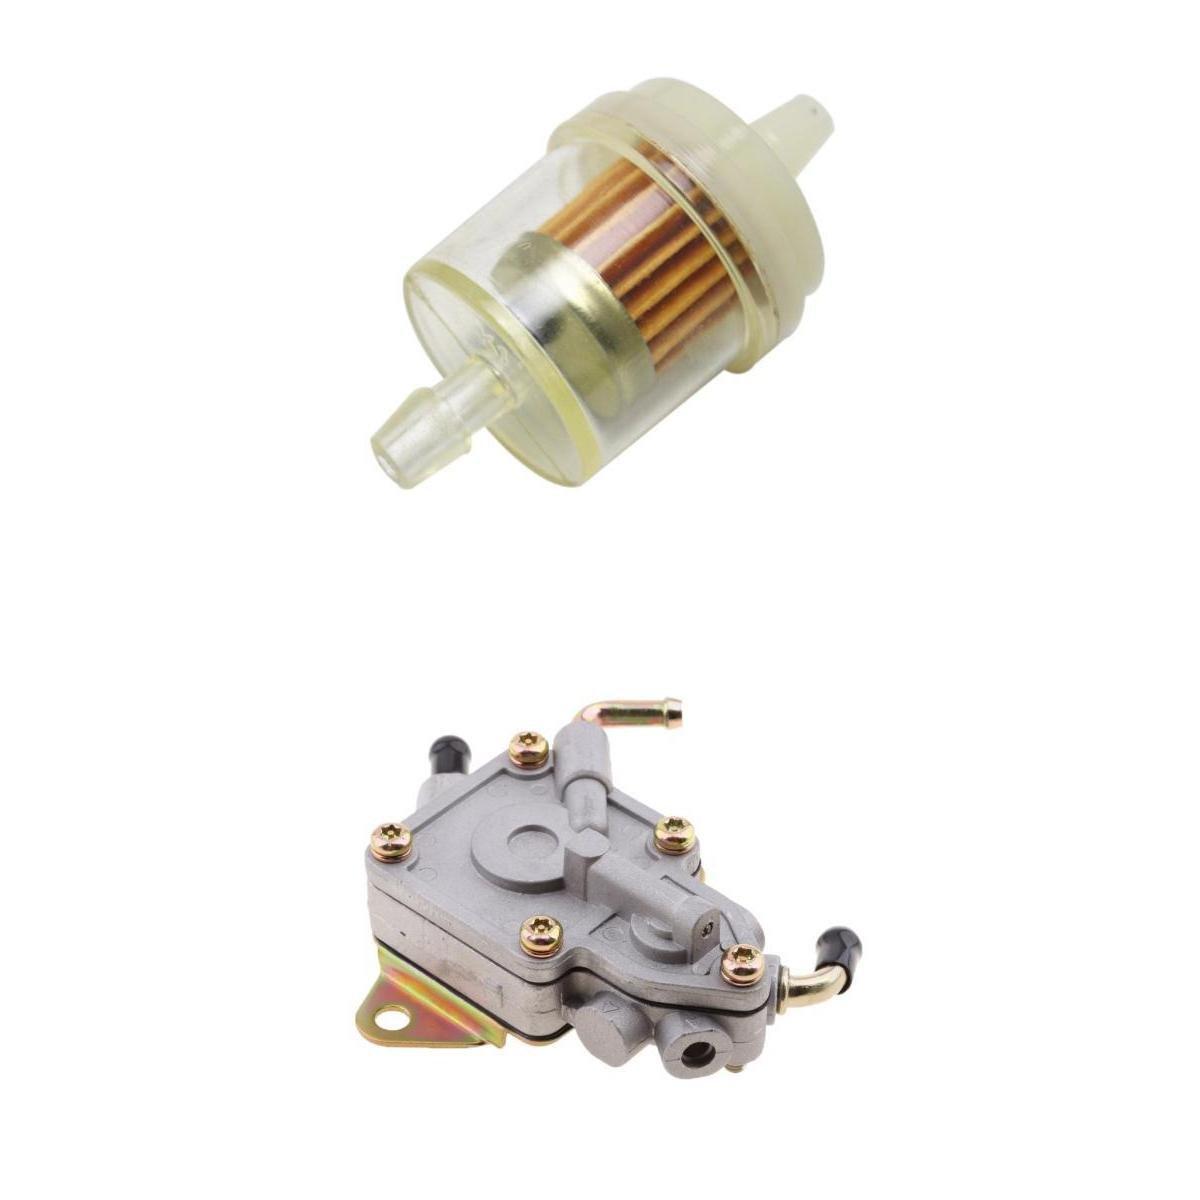 baoblaze fuel pump + filter for yamaha rhino 450 660 utv 5ug-13910-01